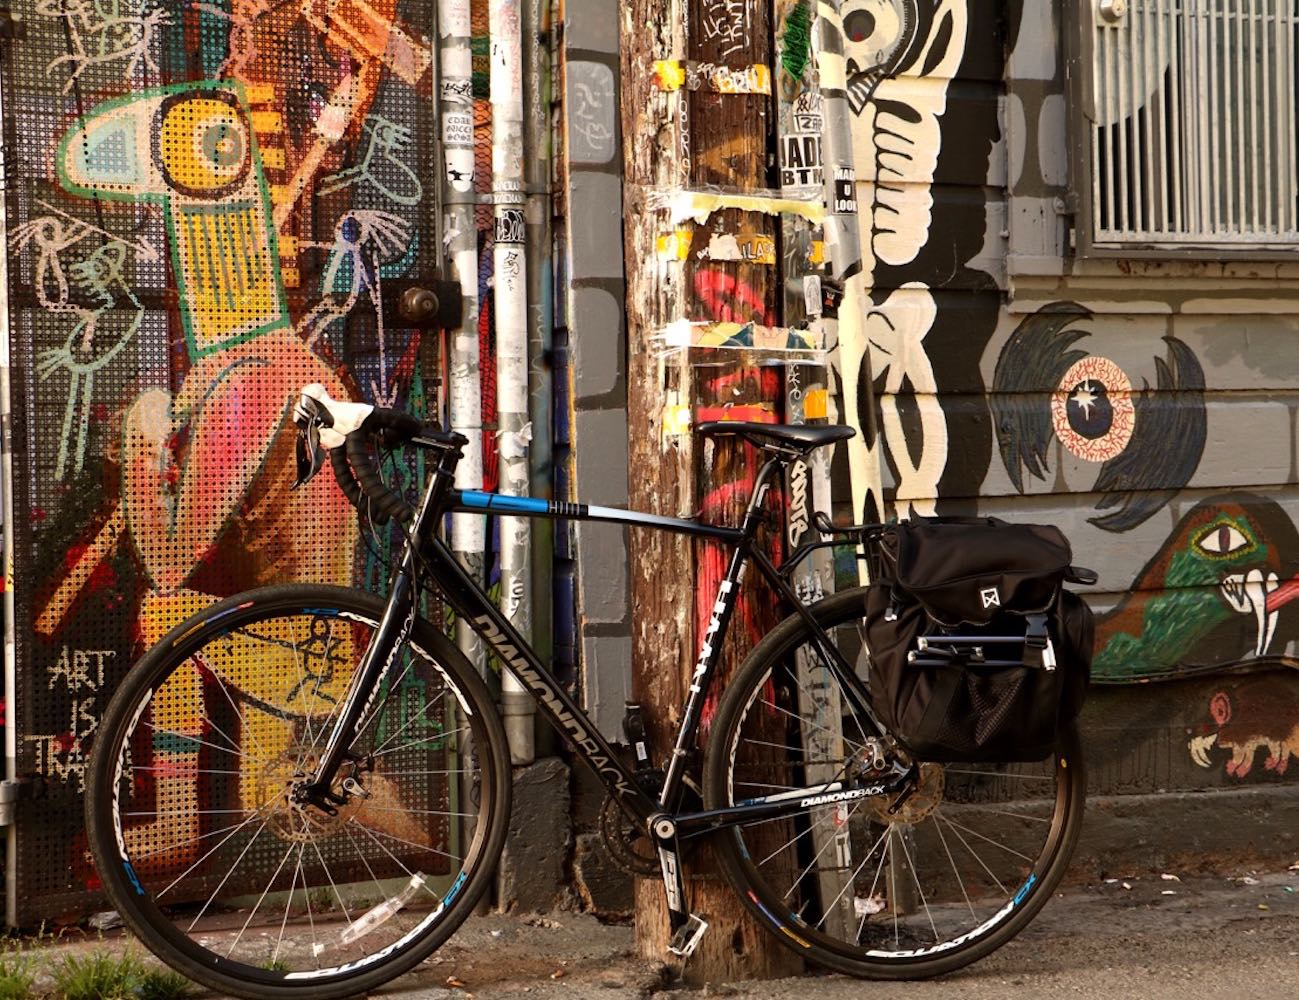 560G Bike Lock by Altor